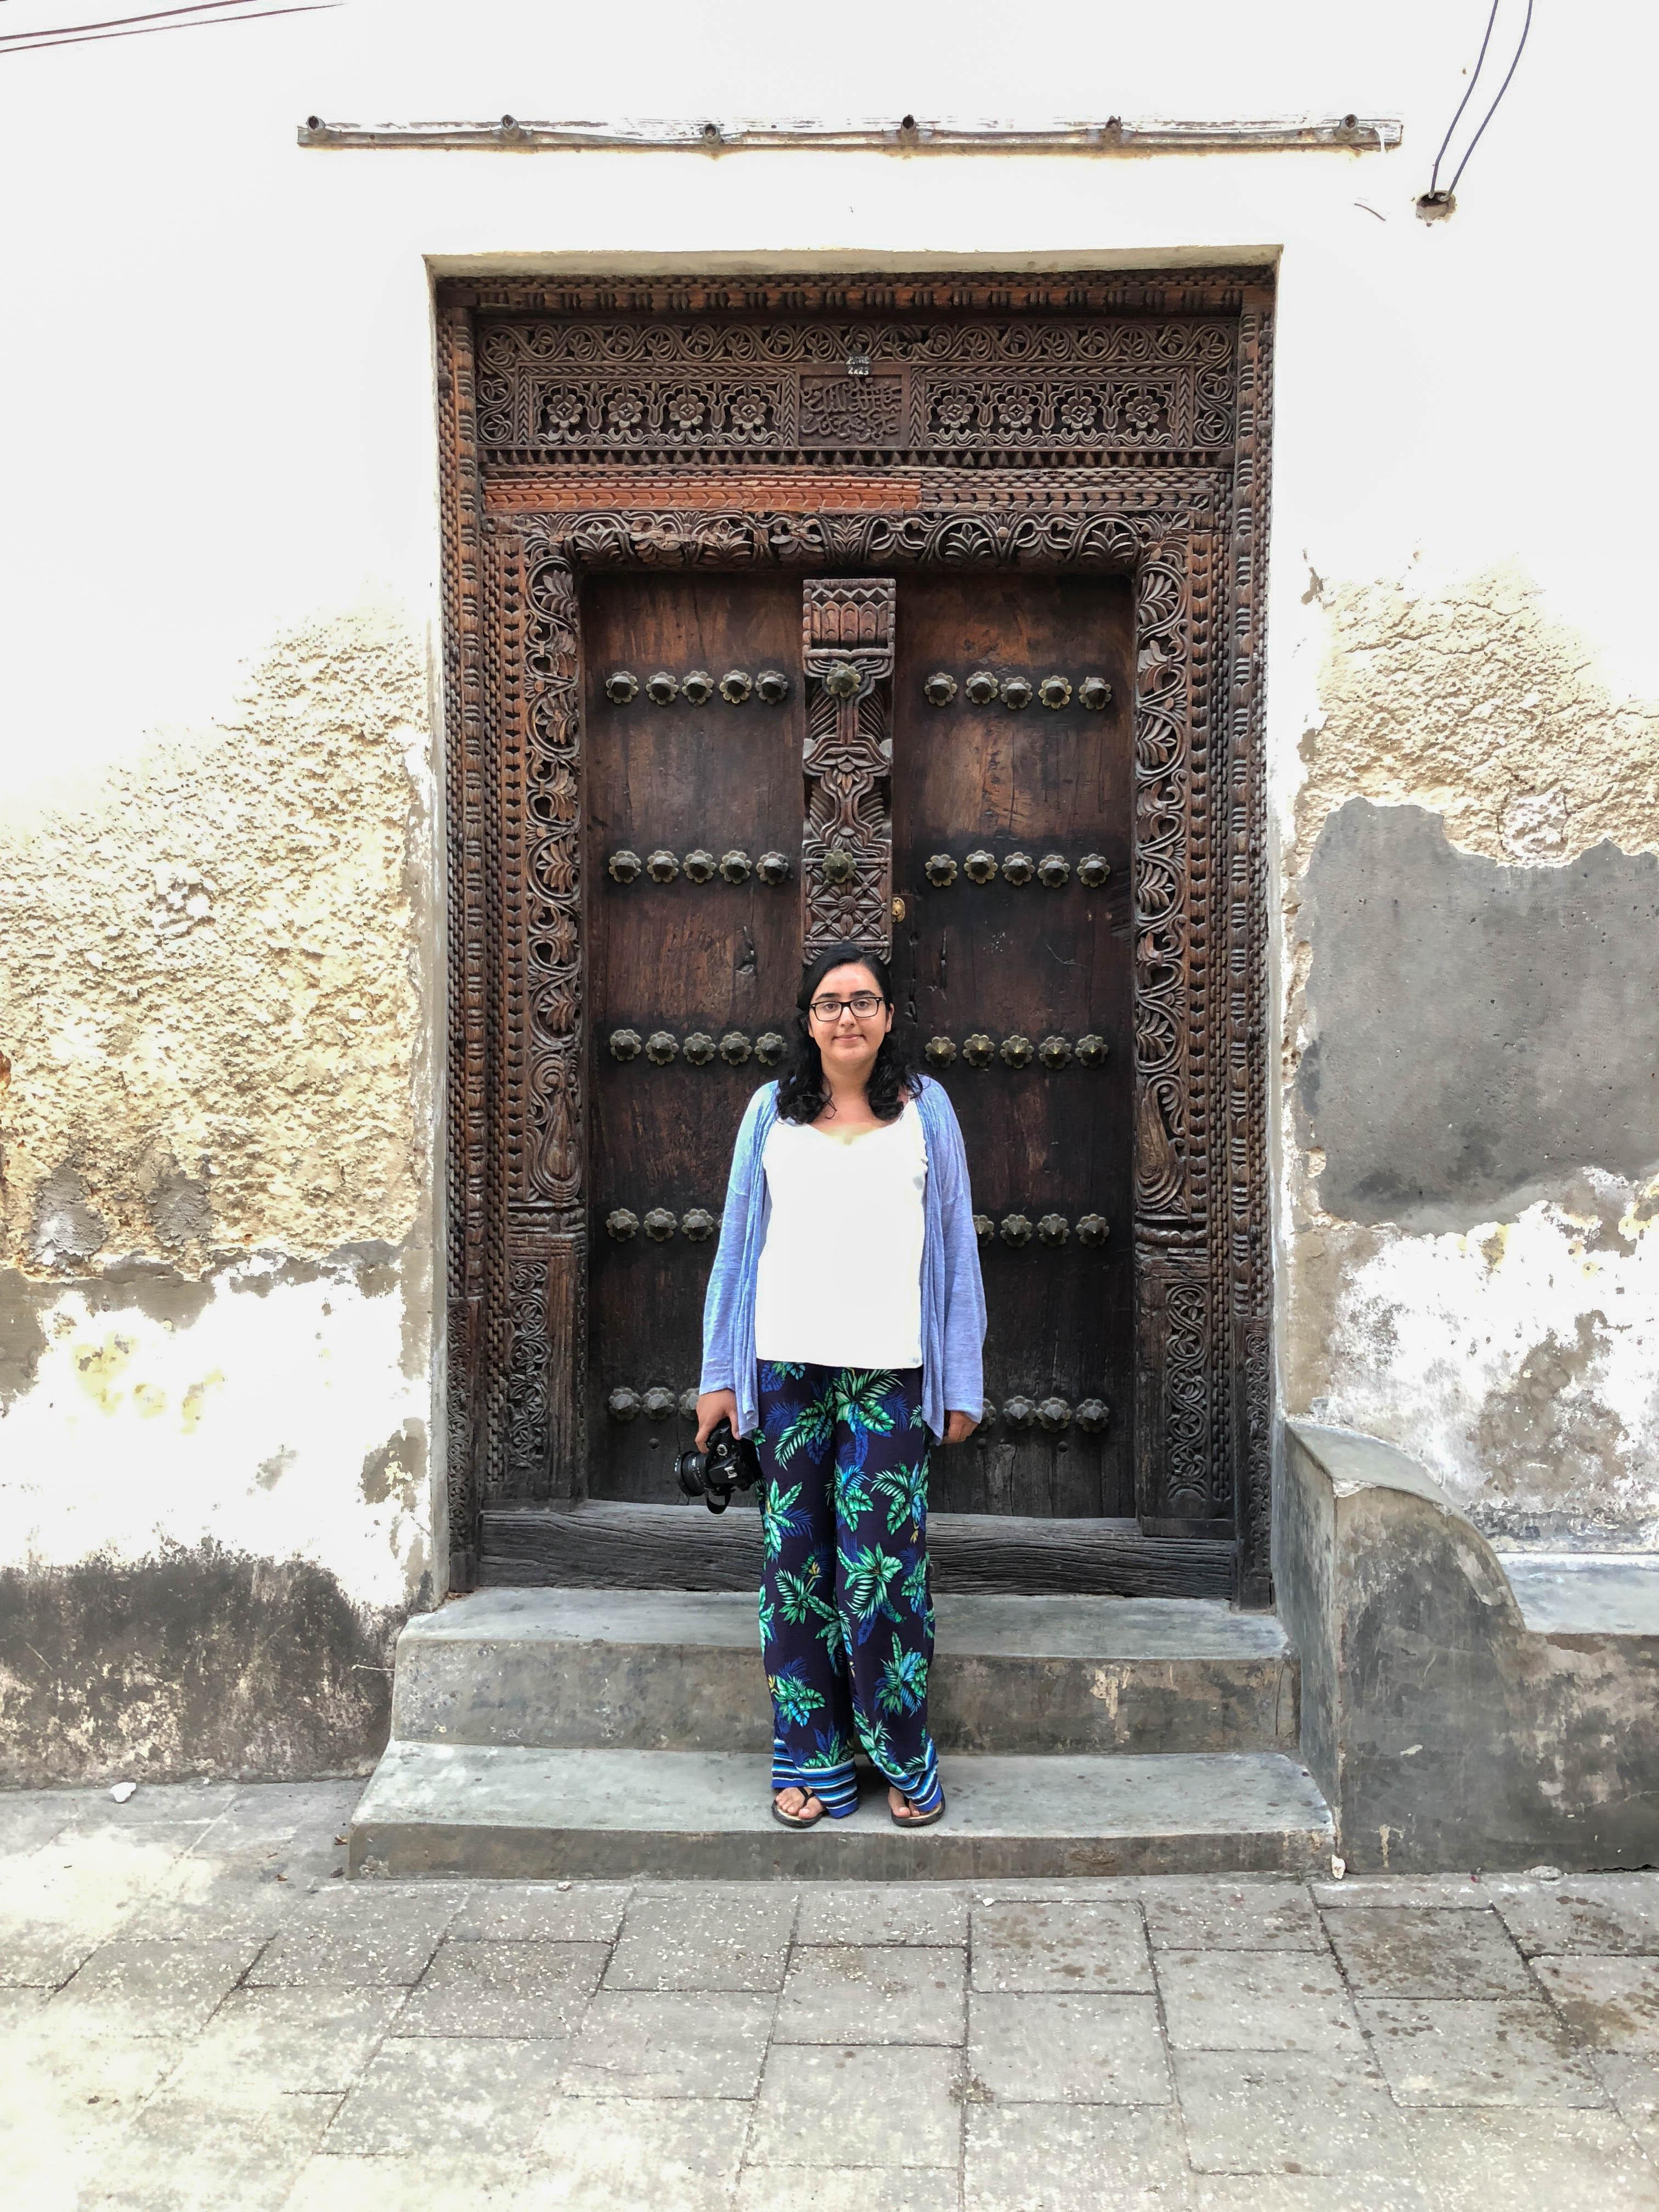 Doors Of Stone Town, Zanzibar, Tanzania